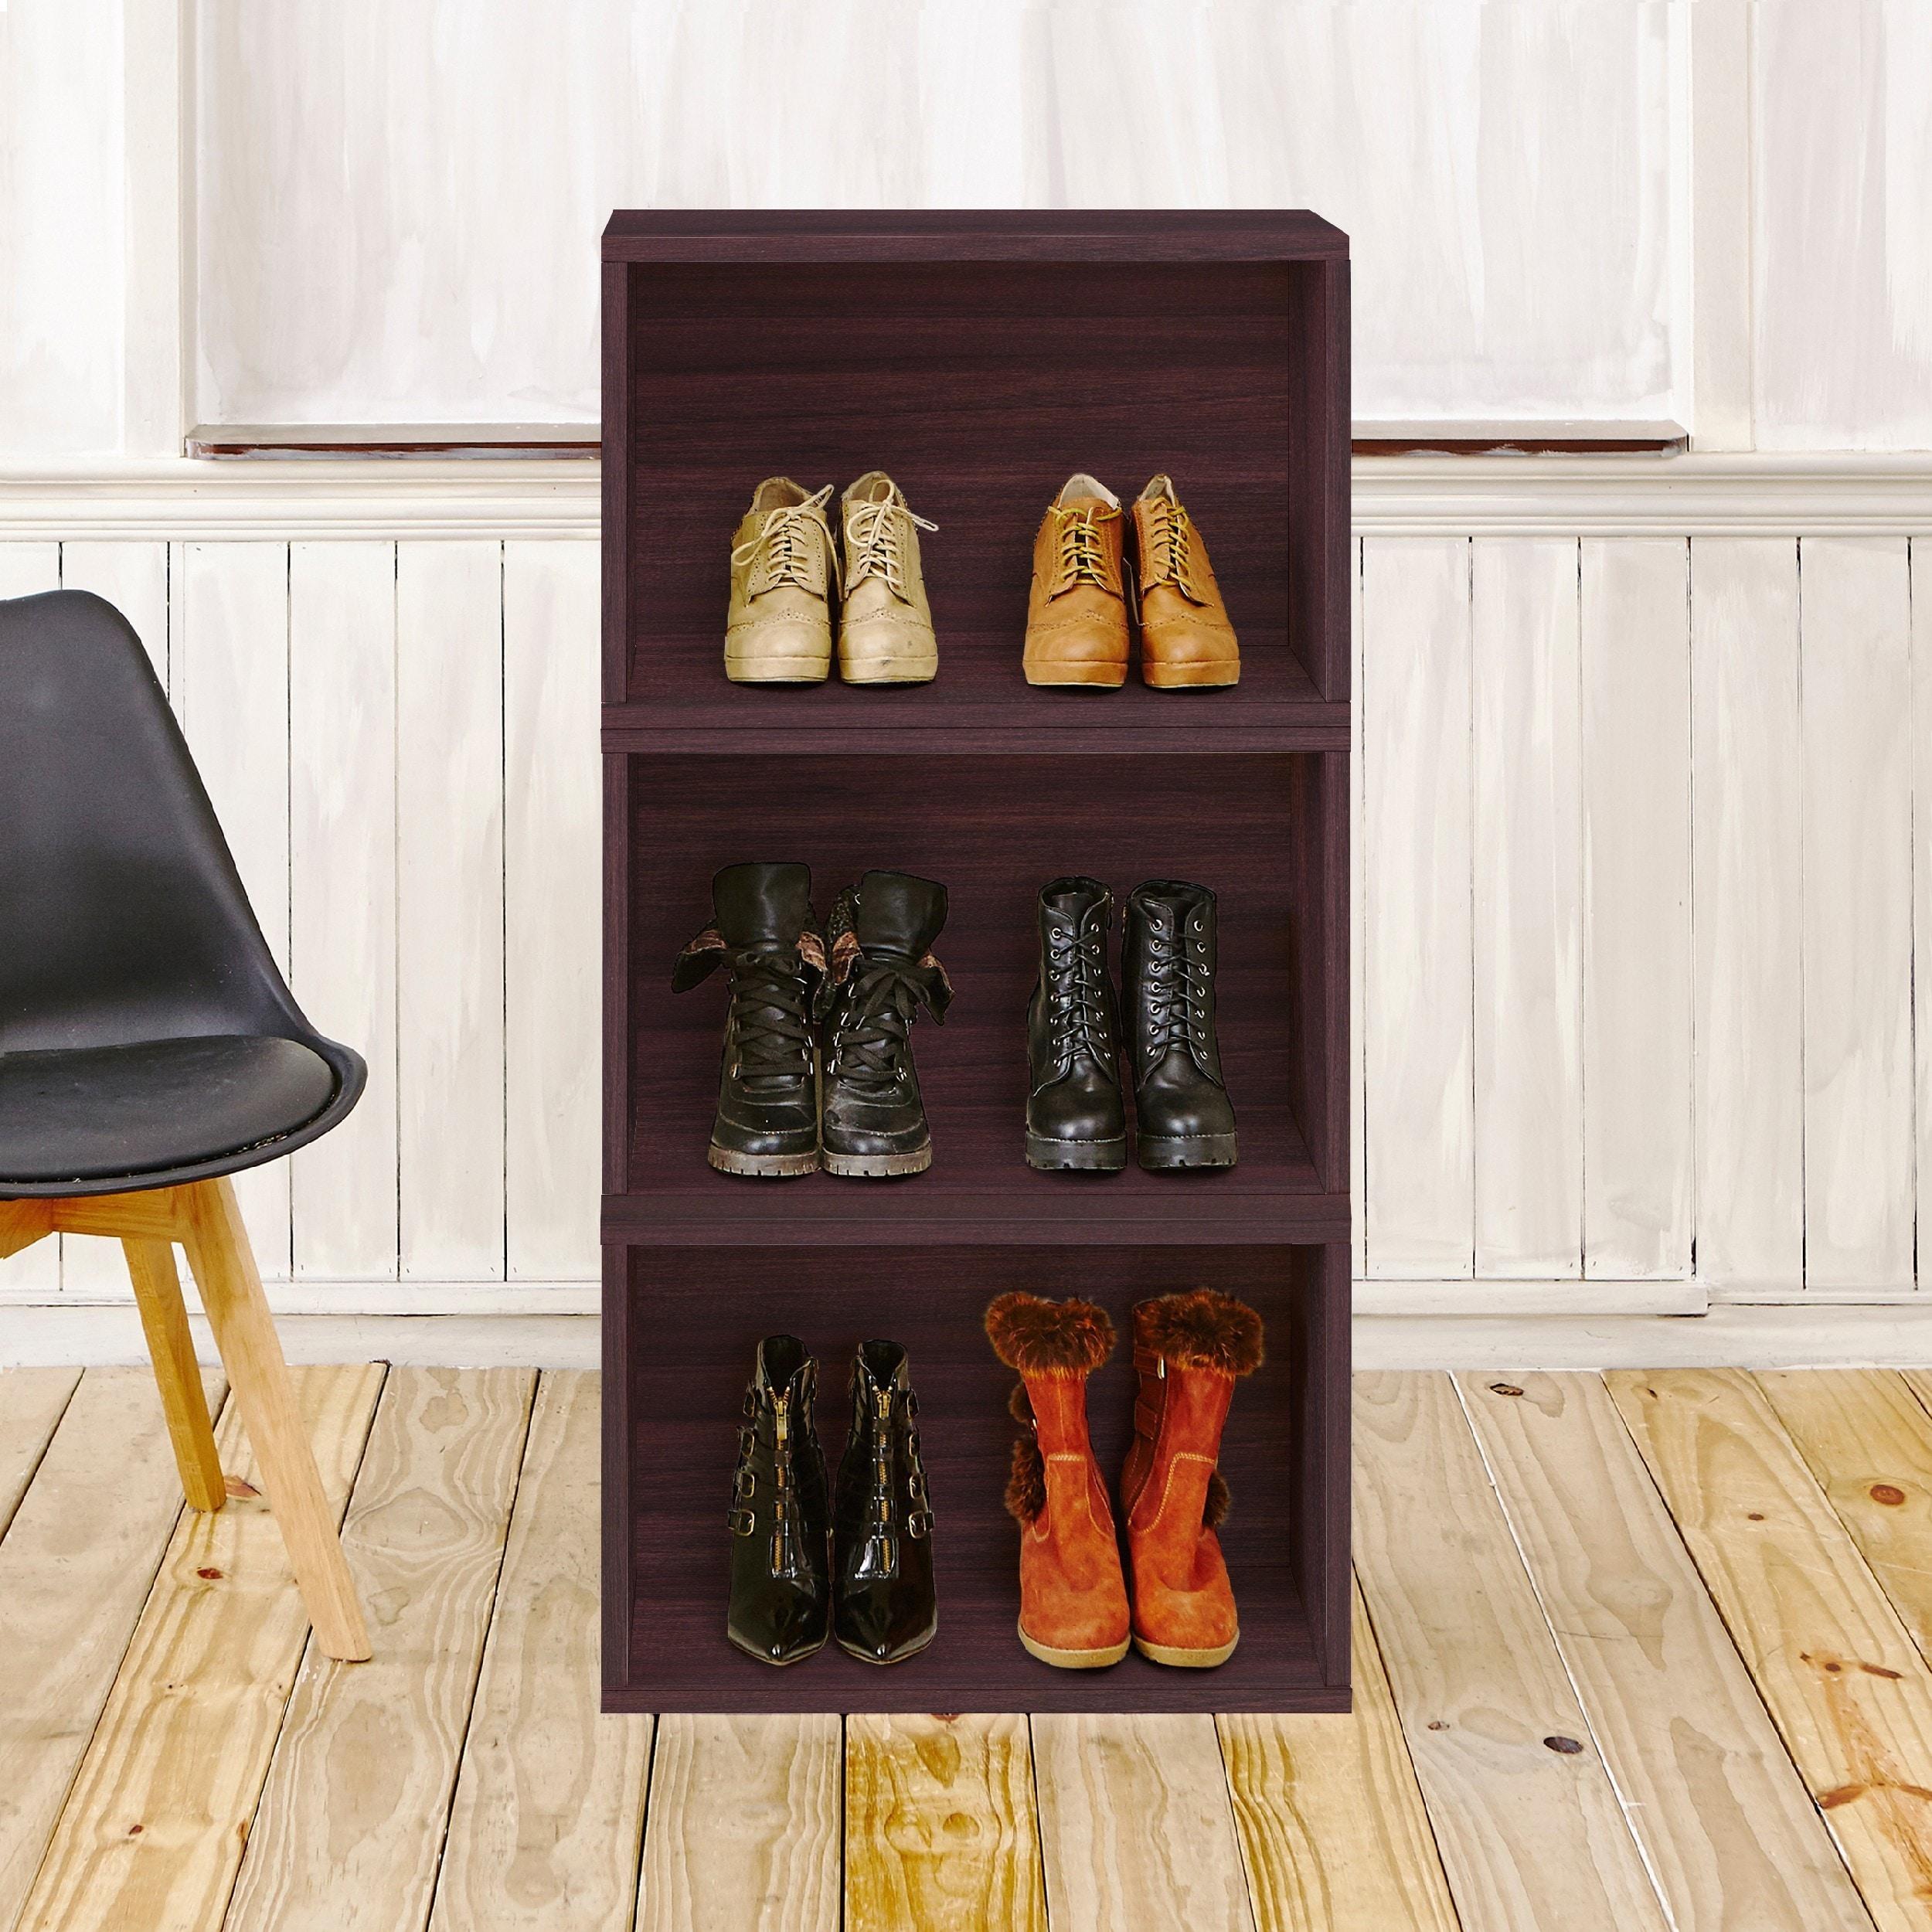 Shop Venice Modular Storage System Shoe Rack Bookcase Shelving By